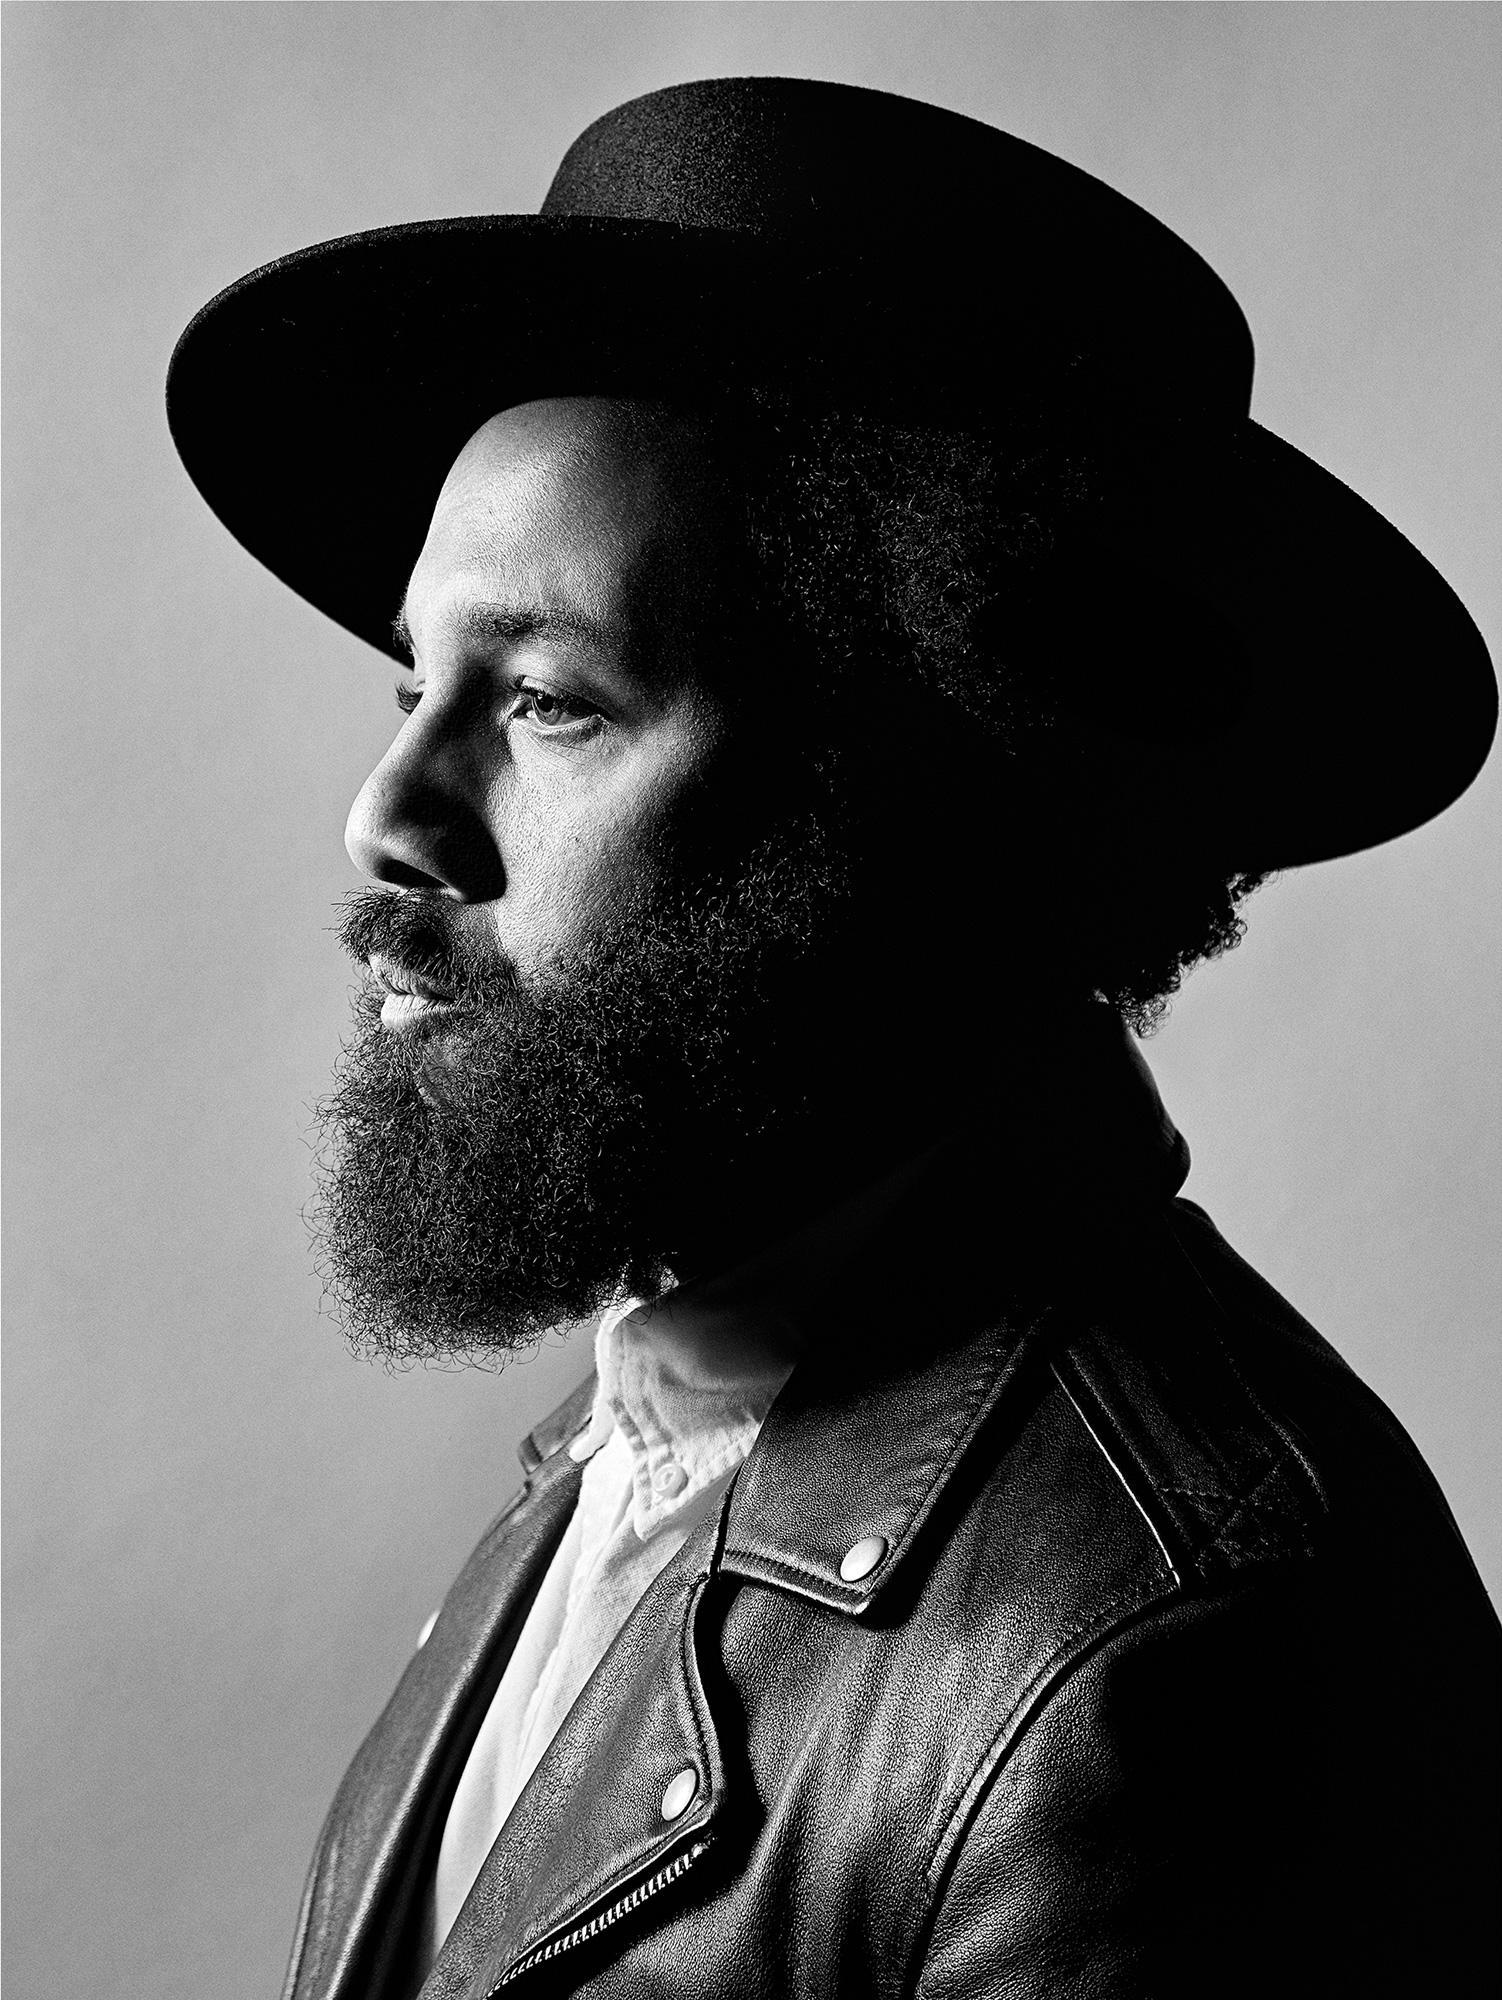 Stylist Curtis Bright